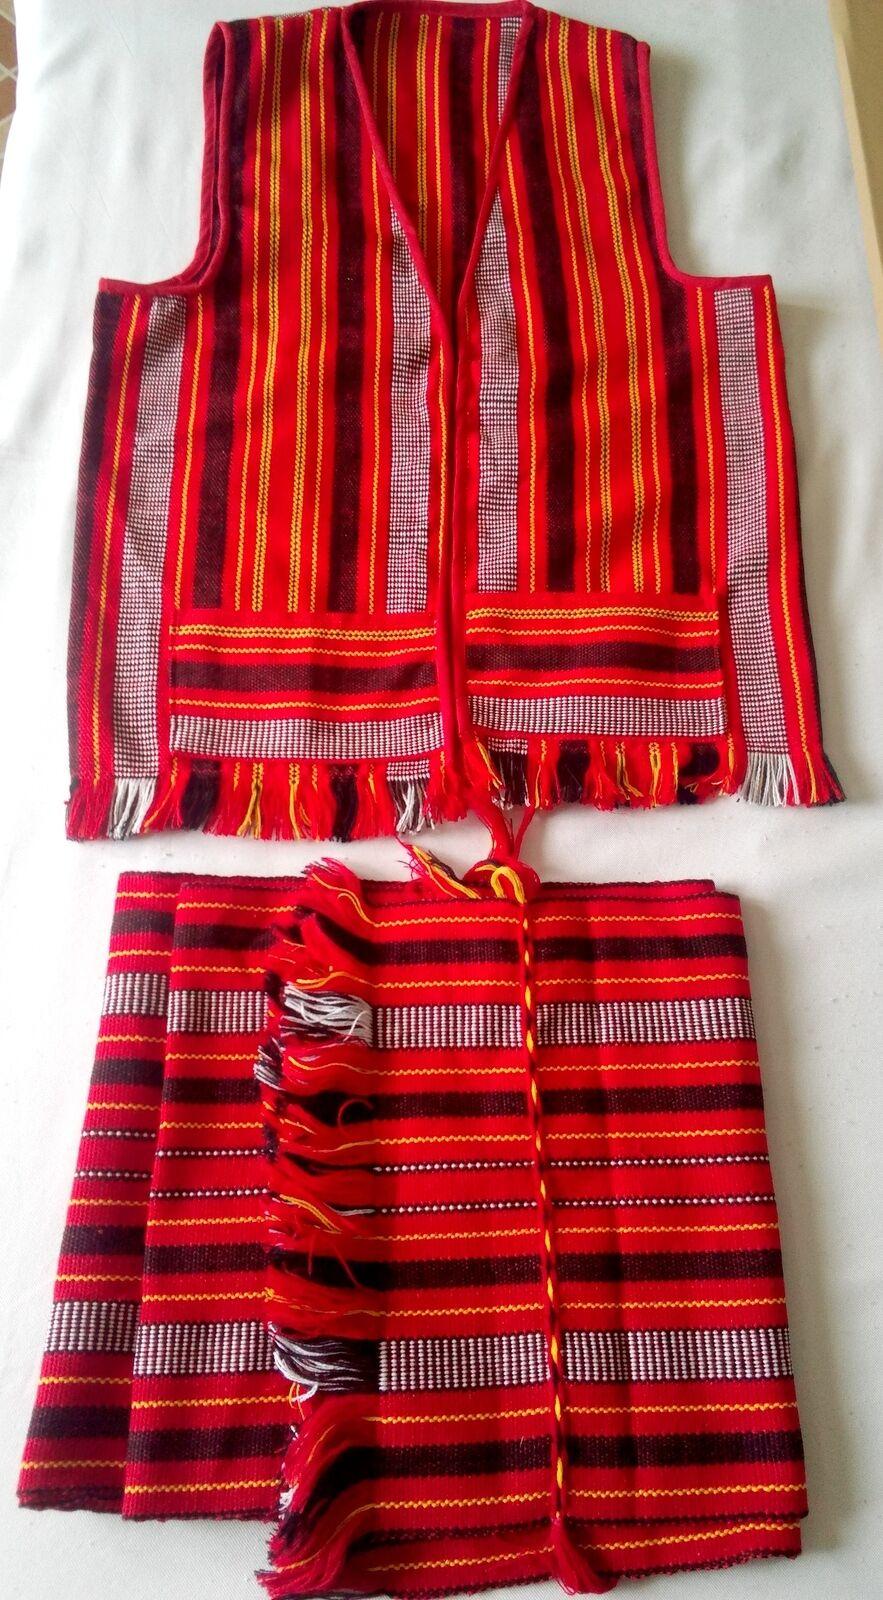 Loincloth Bahag Amp Vest Ifugao Igorot Handwoven Fabric